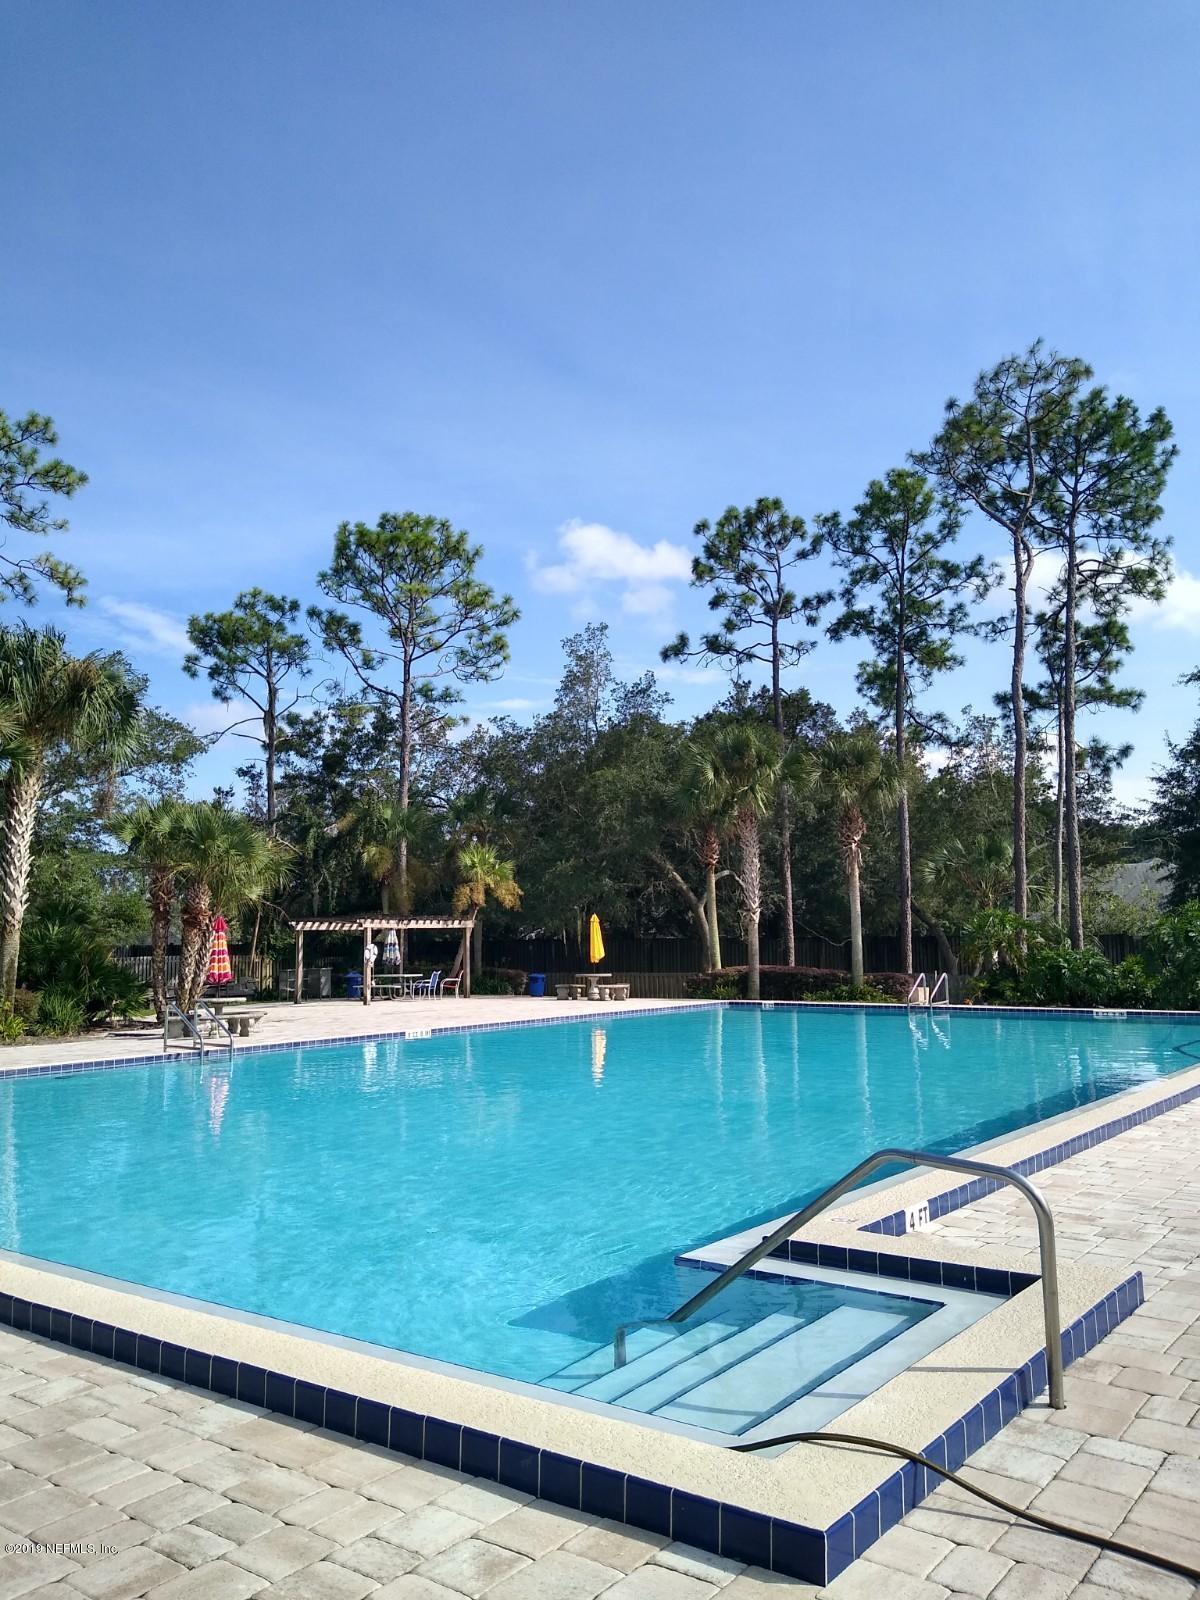 8849 OLD KINGS, JACKSONVILLE, FLORIDA 32257, 2 Bedrooms Bedrooms, ,1 BathroomBathrooms,Condo,For sale,OLD KINGS,1010505